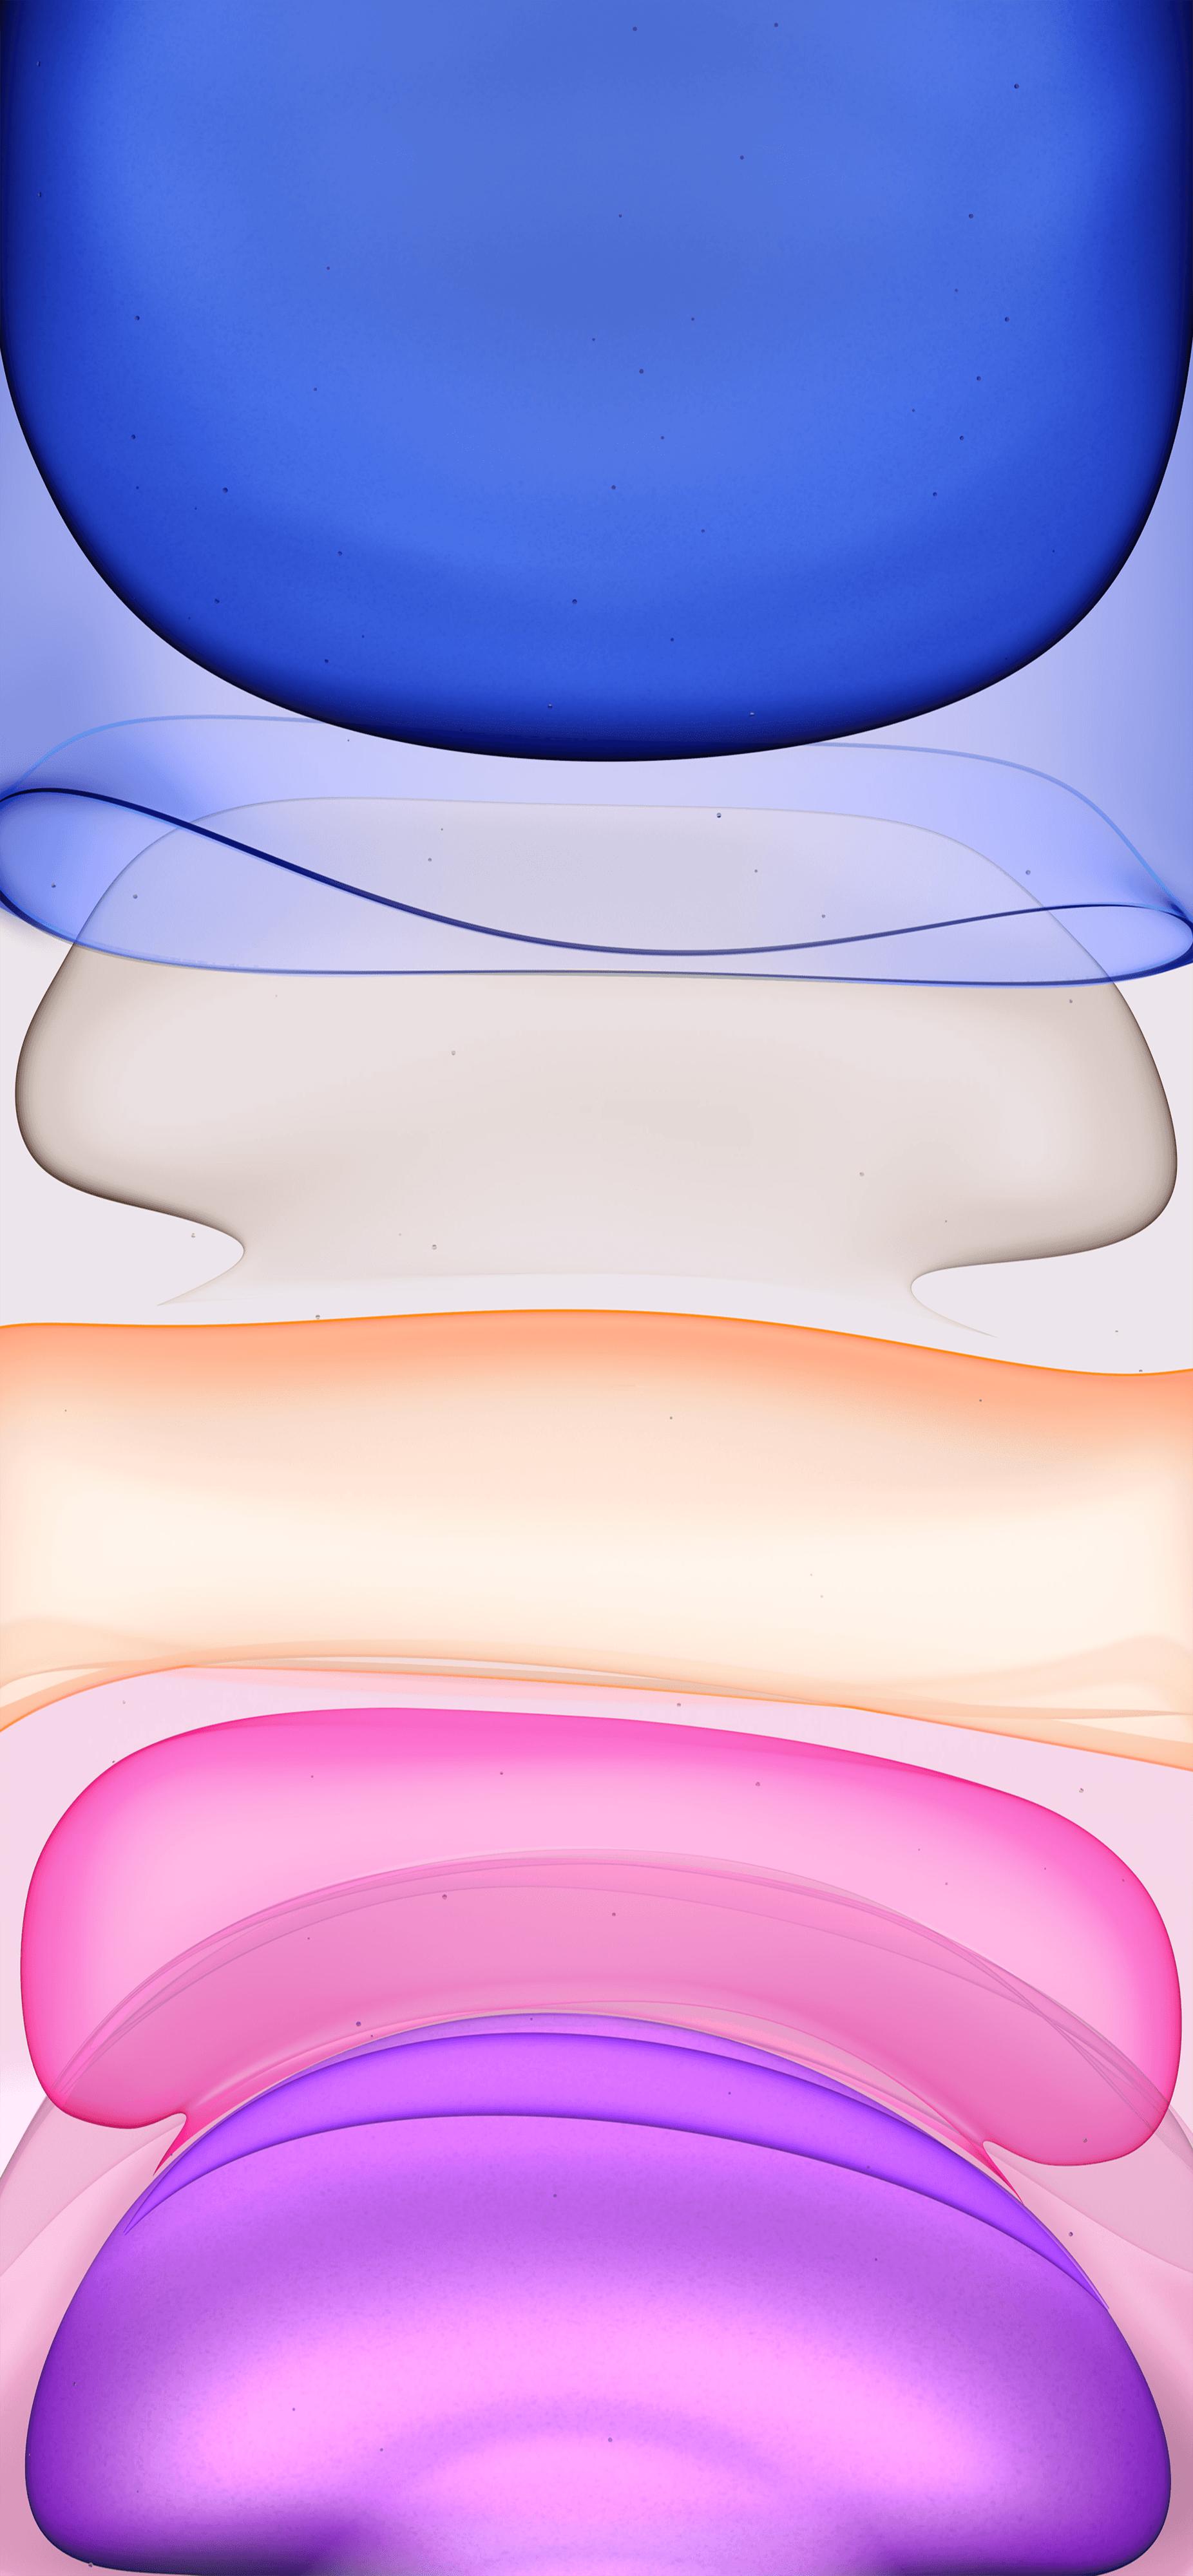 Apple Iphone 11 4k Wallpapers Wallpaper Cave